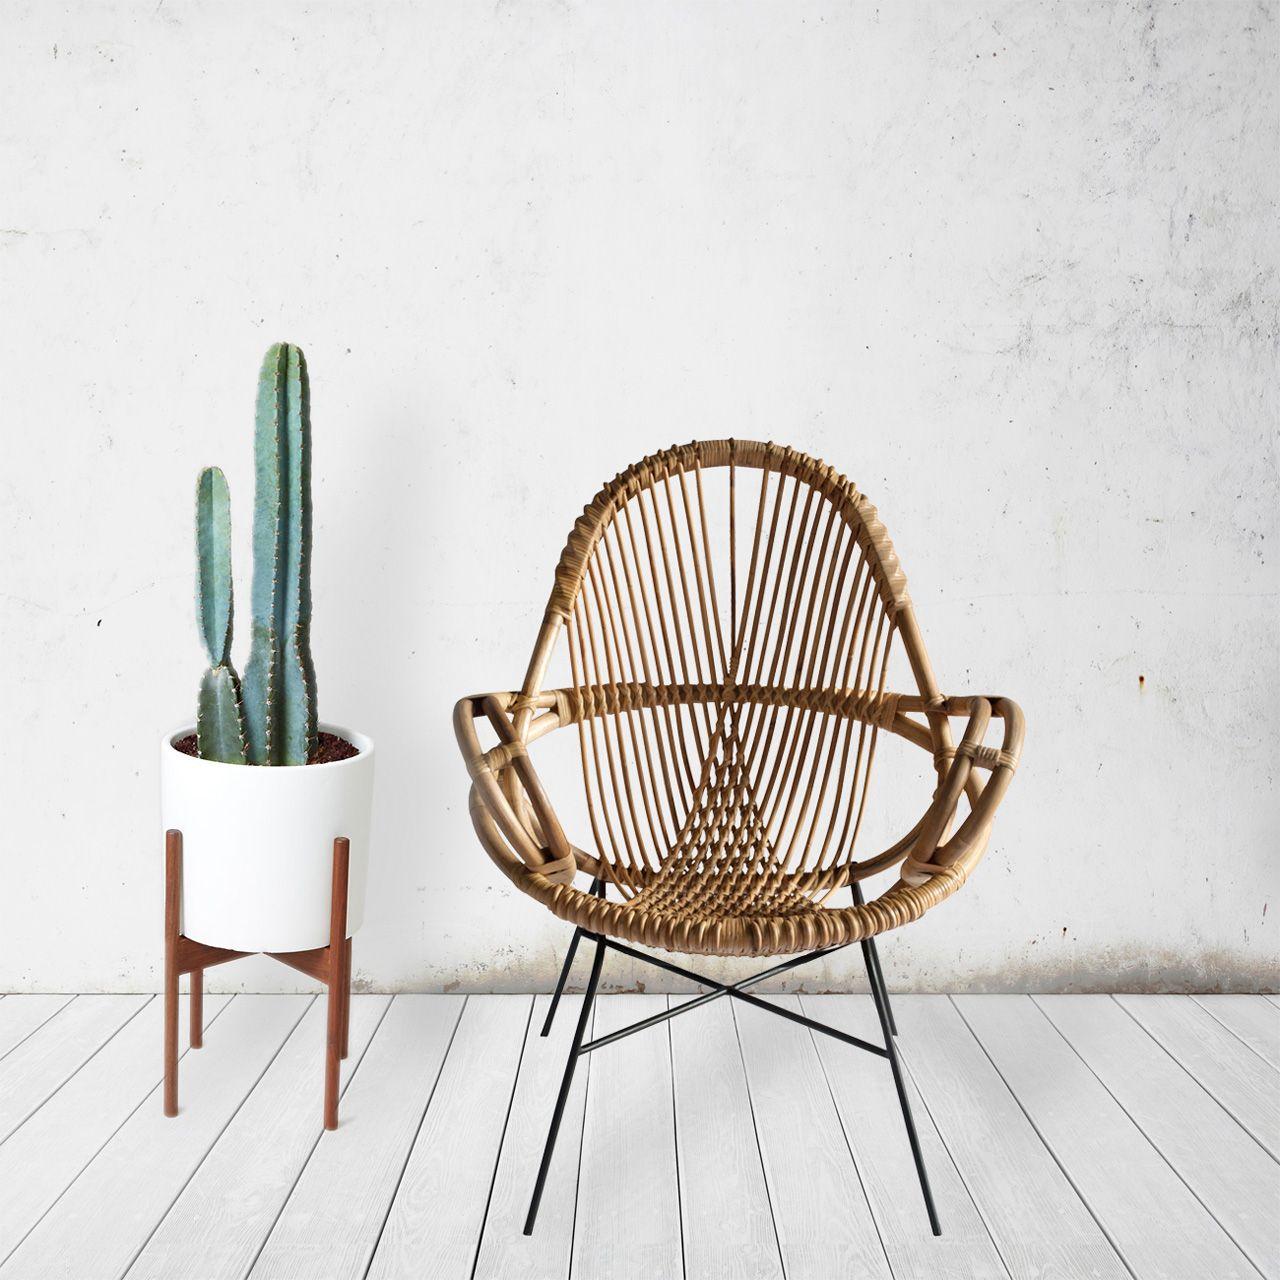 WEND-Studio-1-Diamond_Rattan_Chair | Sillas, Rattan y Butacas